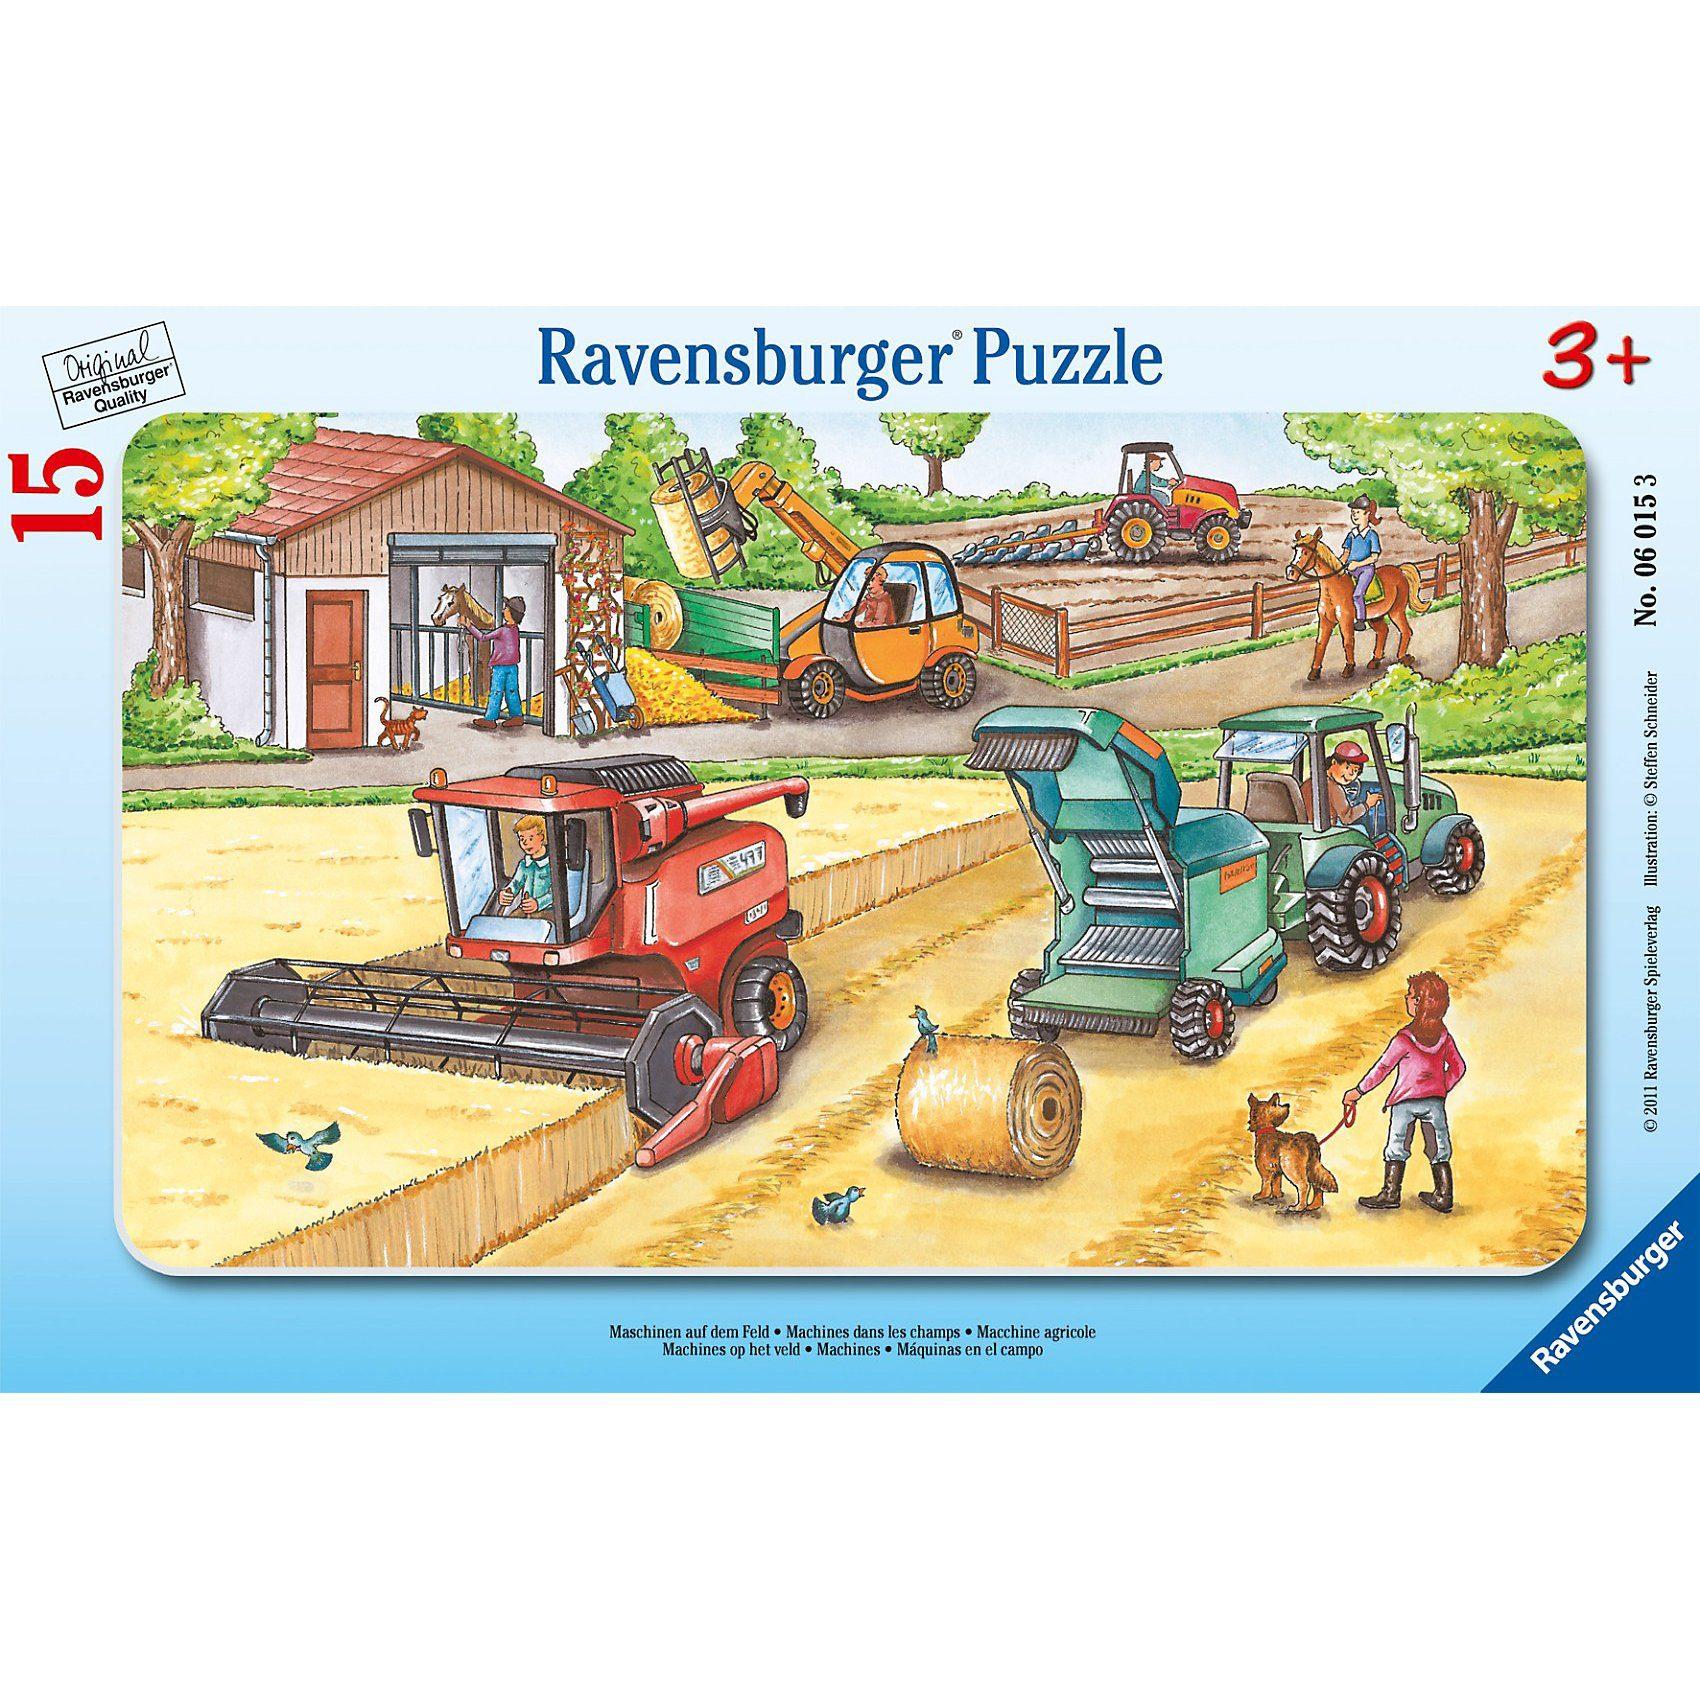 Ravensburger Maschinen auf dem Feld - 15 Teile Rahmenpuzzle